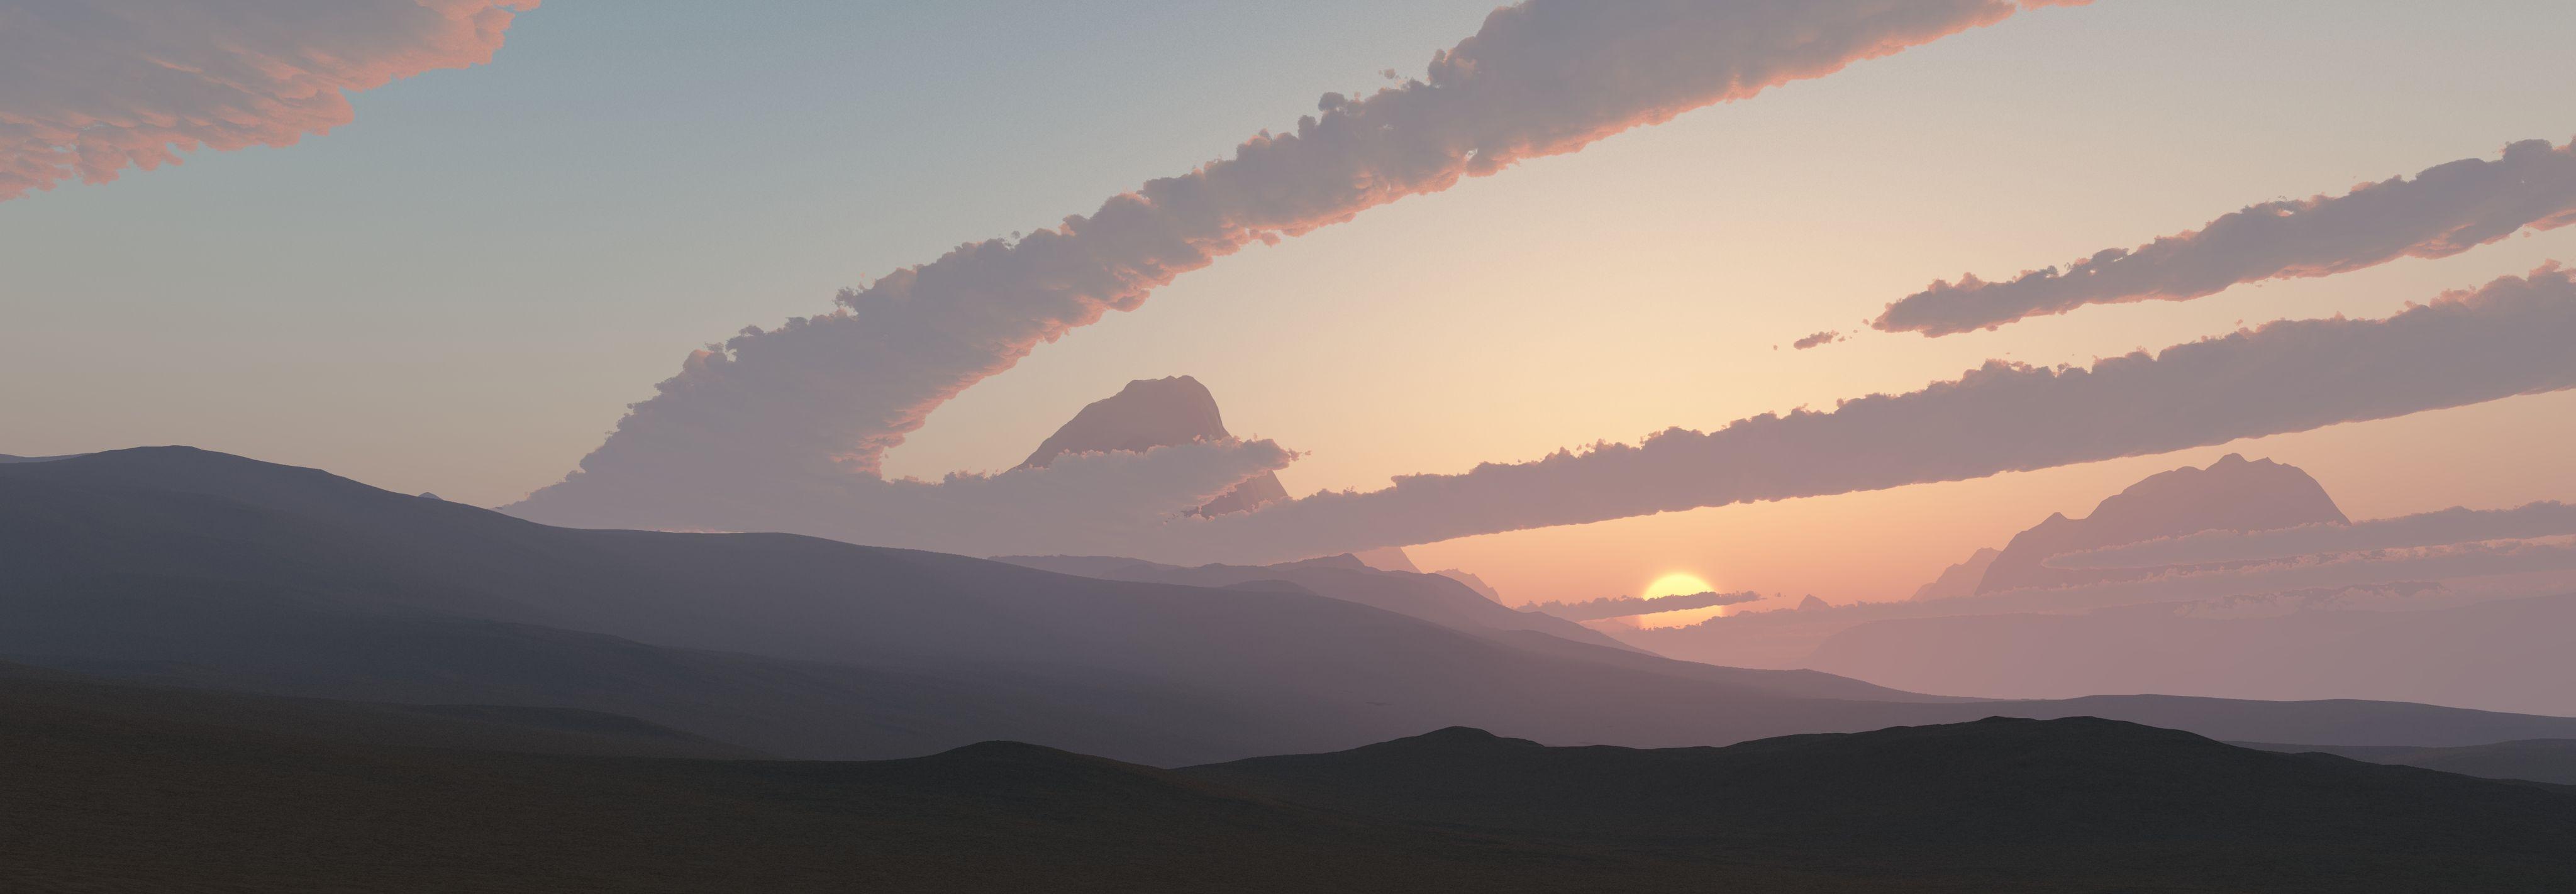 desert #sunset #background #colors #wide #hd #surreal #purple #hazy